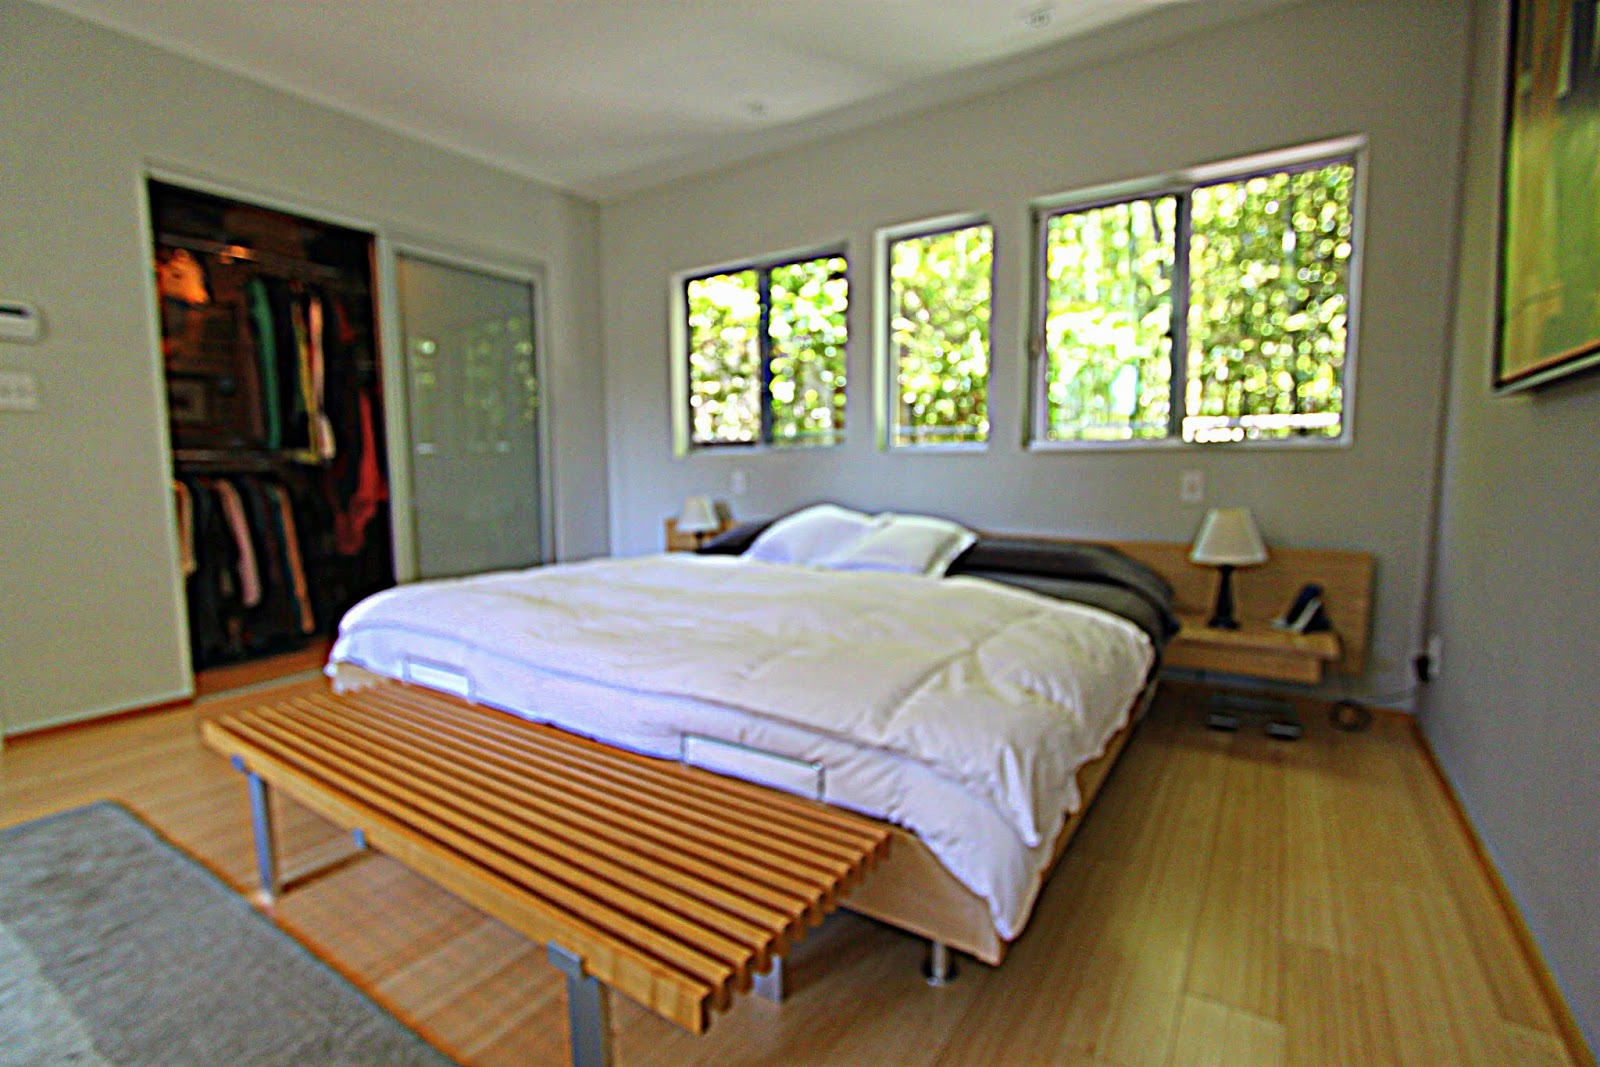 Herman Miller Bedroom Furniture Creepingthymeinfo - Herman miller bedroom furniture